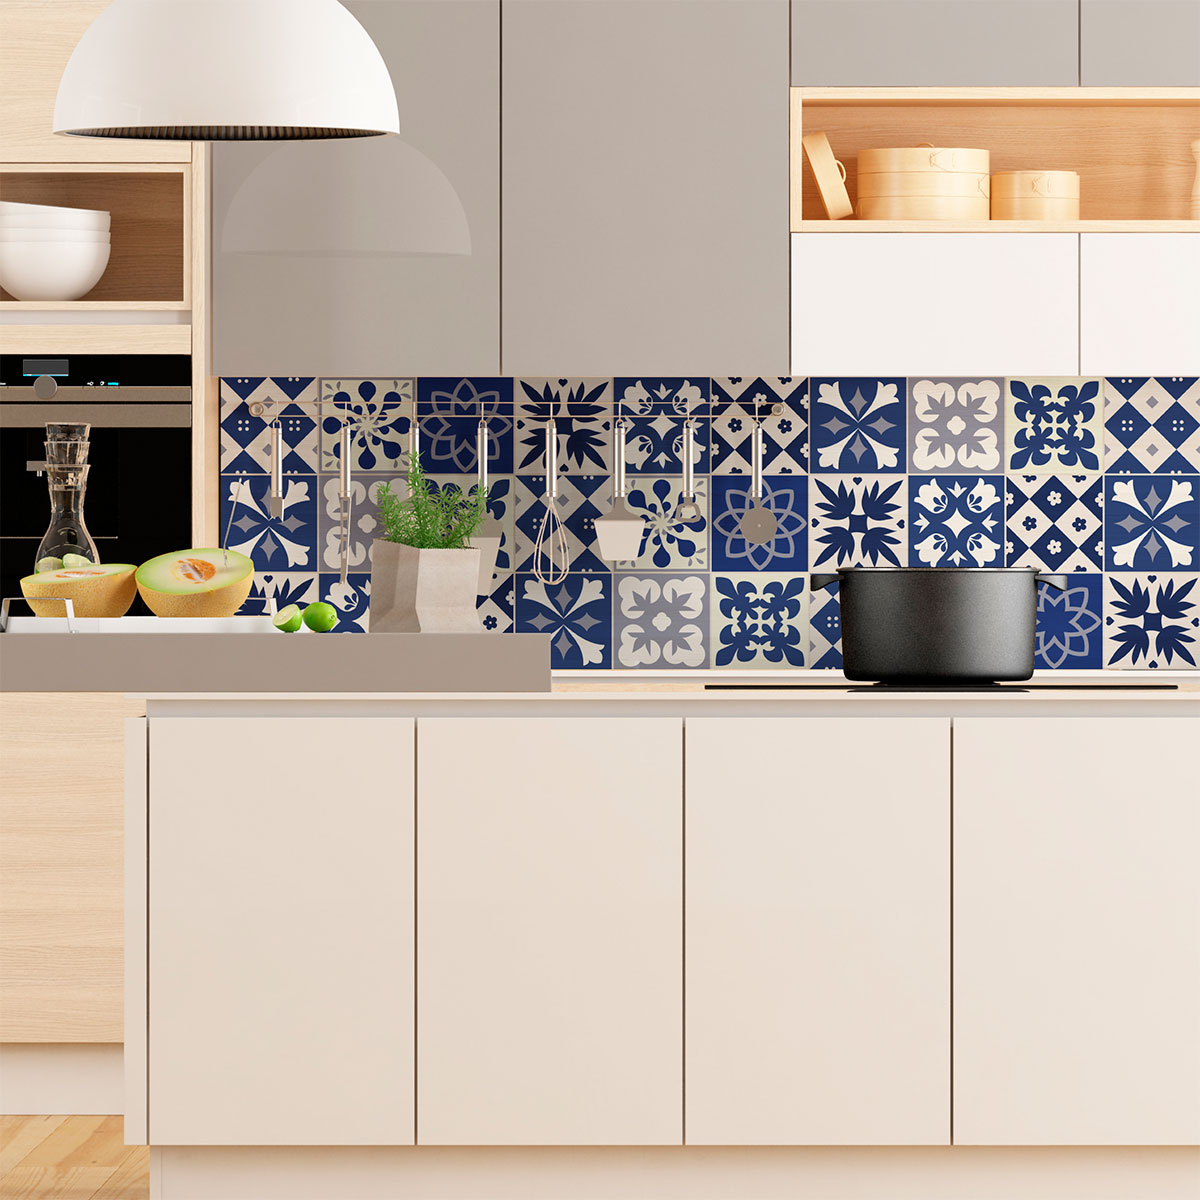 9 stickers carreaux de ciment azulejos linia cuisine carrelages ambiance sticker. Black Bedroom Furniture Sets. Home Design Ideas